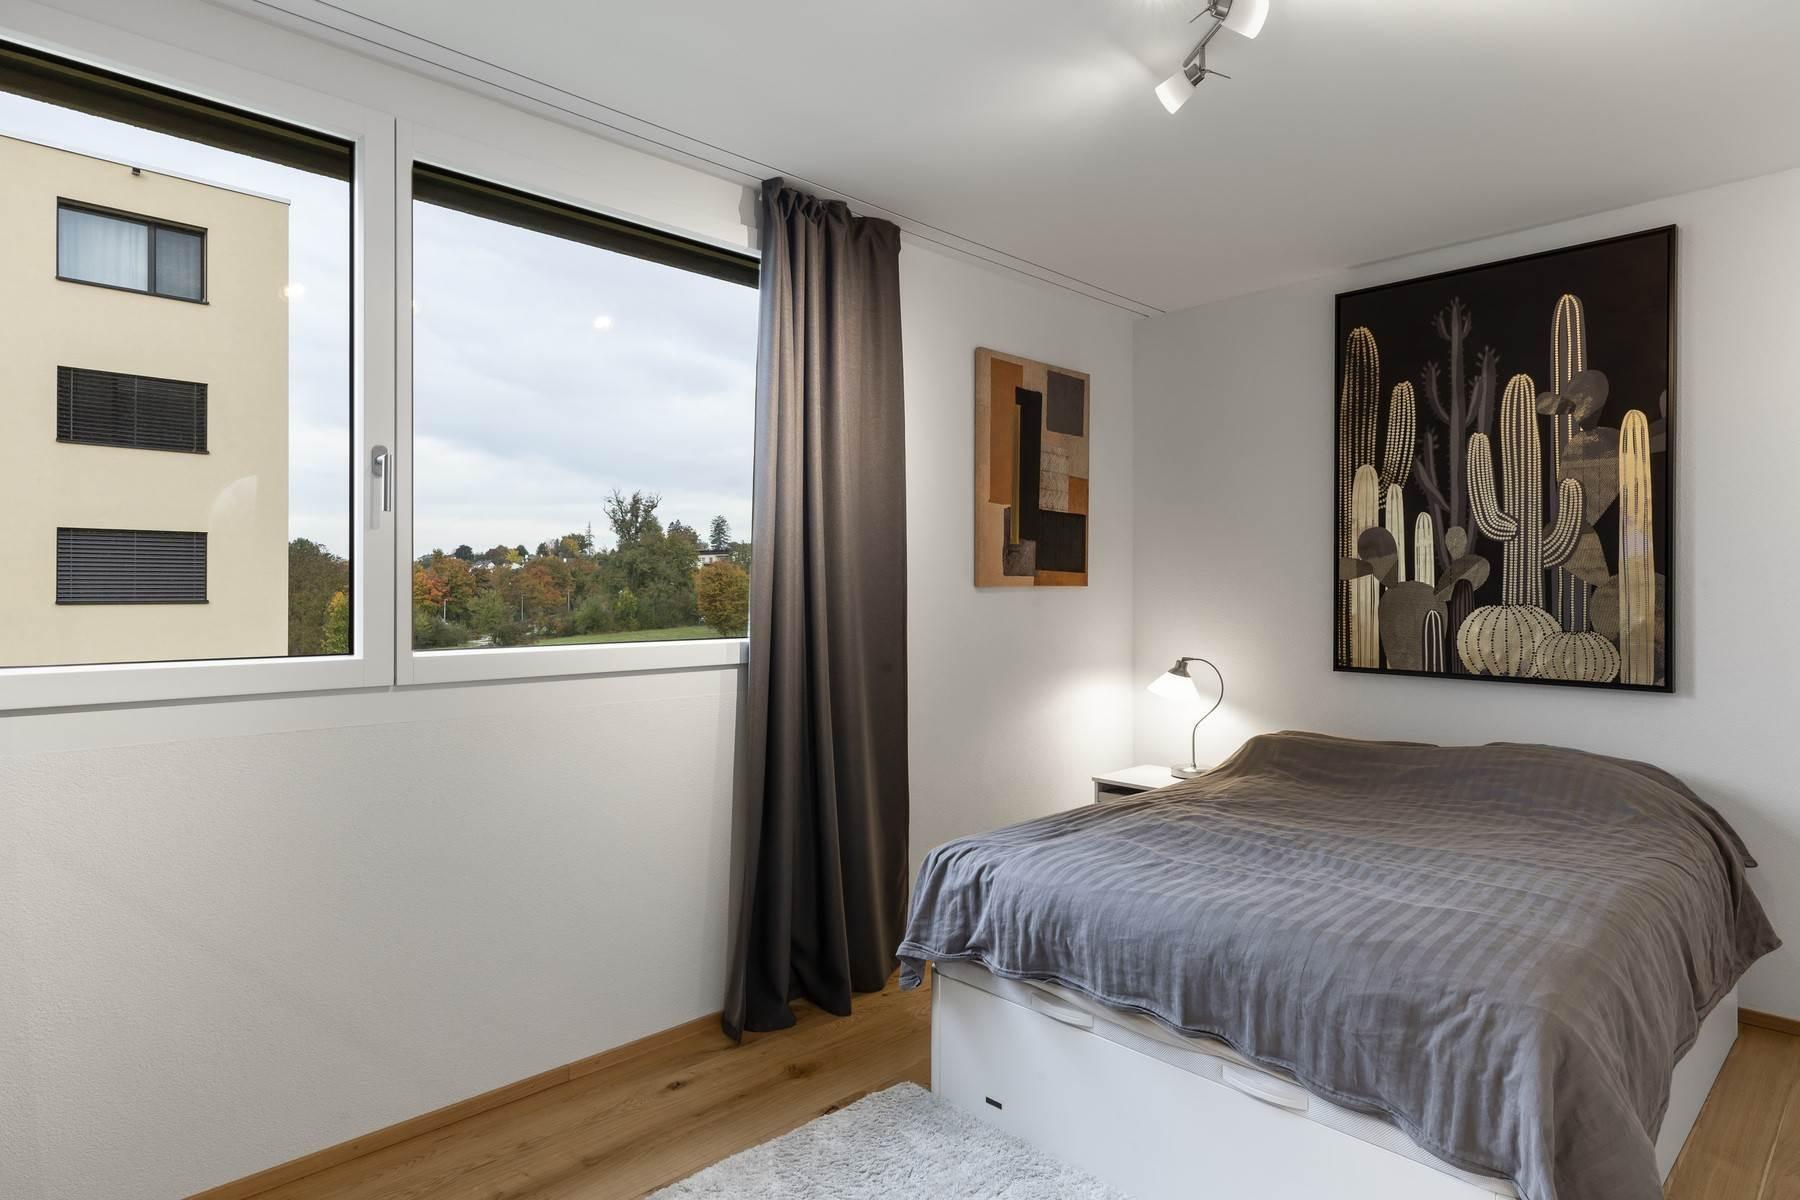 Villars-sur-Glâne Villars Sur Glane Fribourg, 11  Home For Sale 11